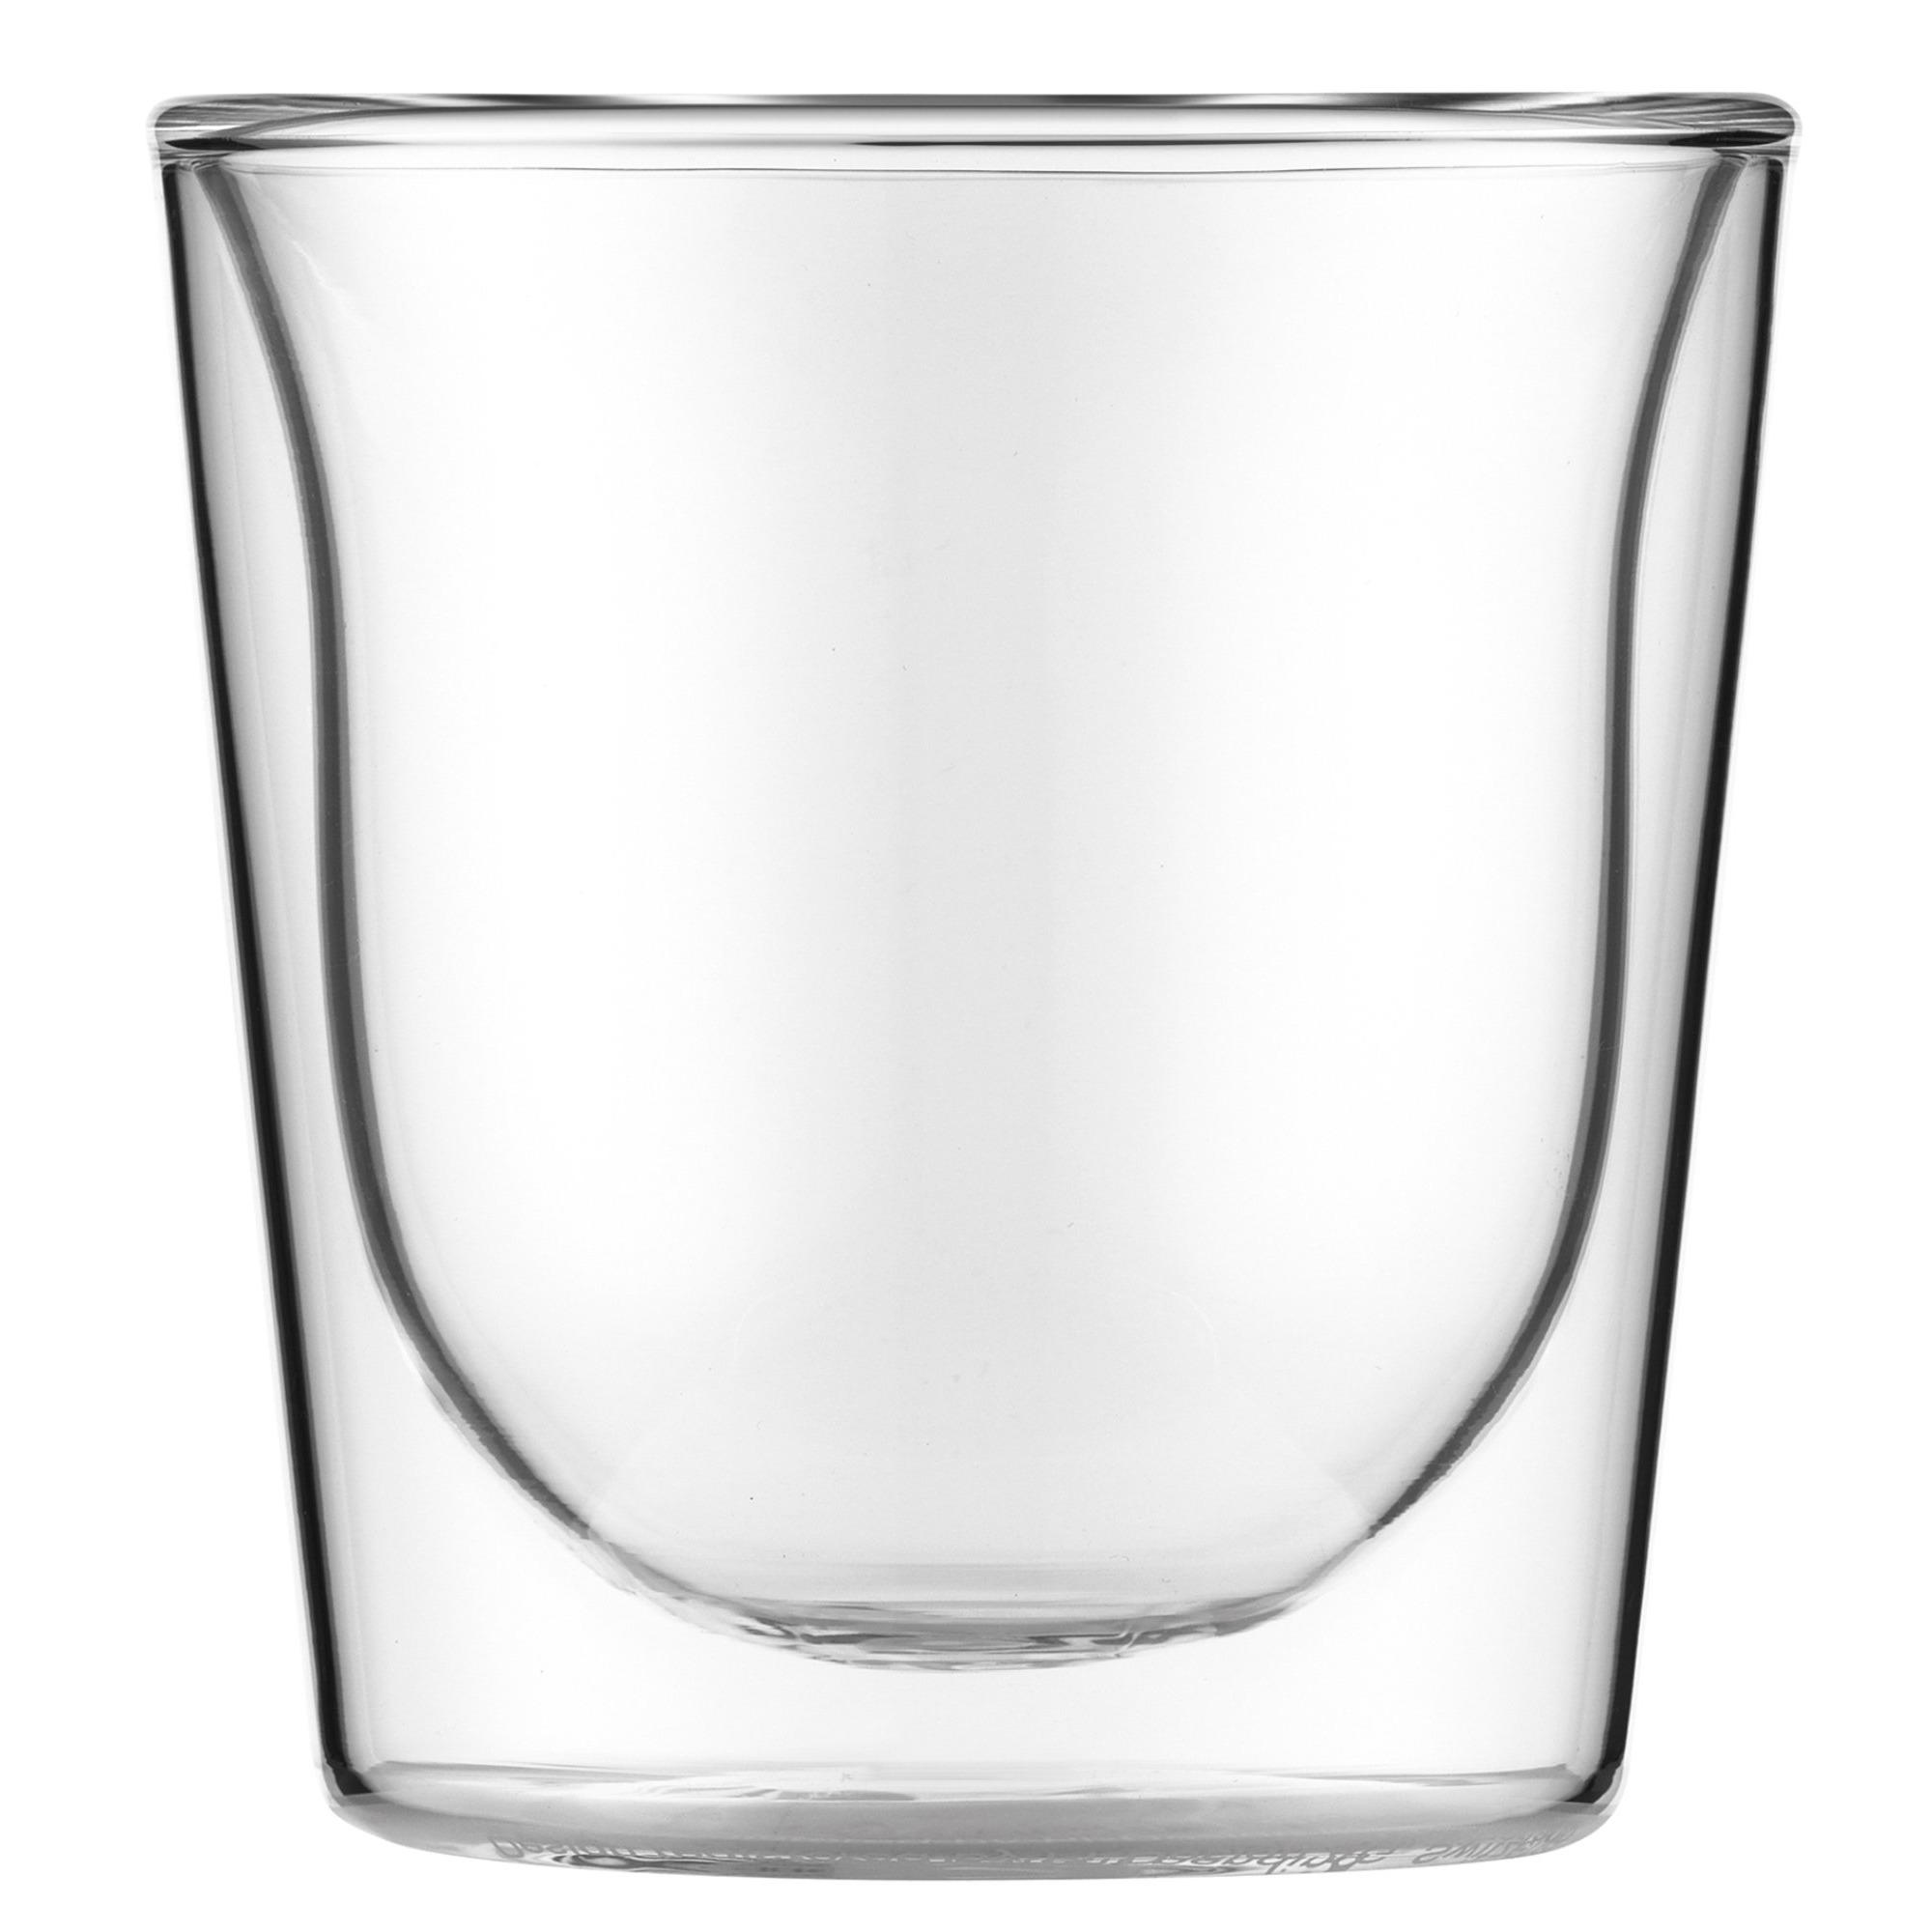 Bodum SKÅL dubbelväggat glas 02 l 2 stk.